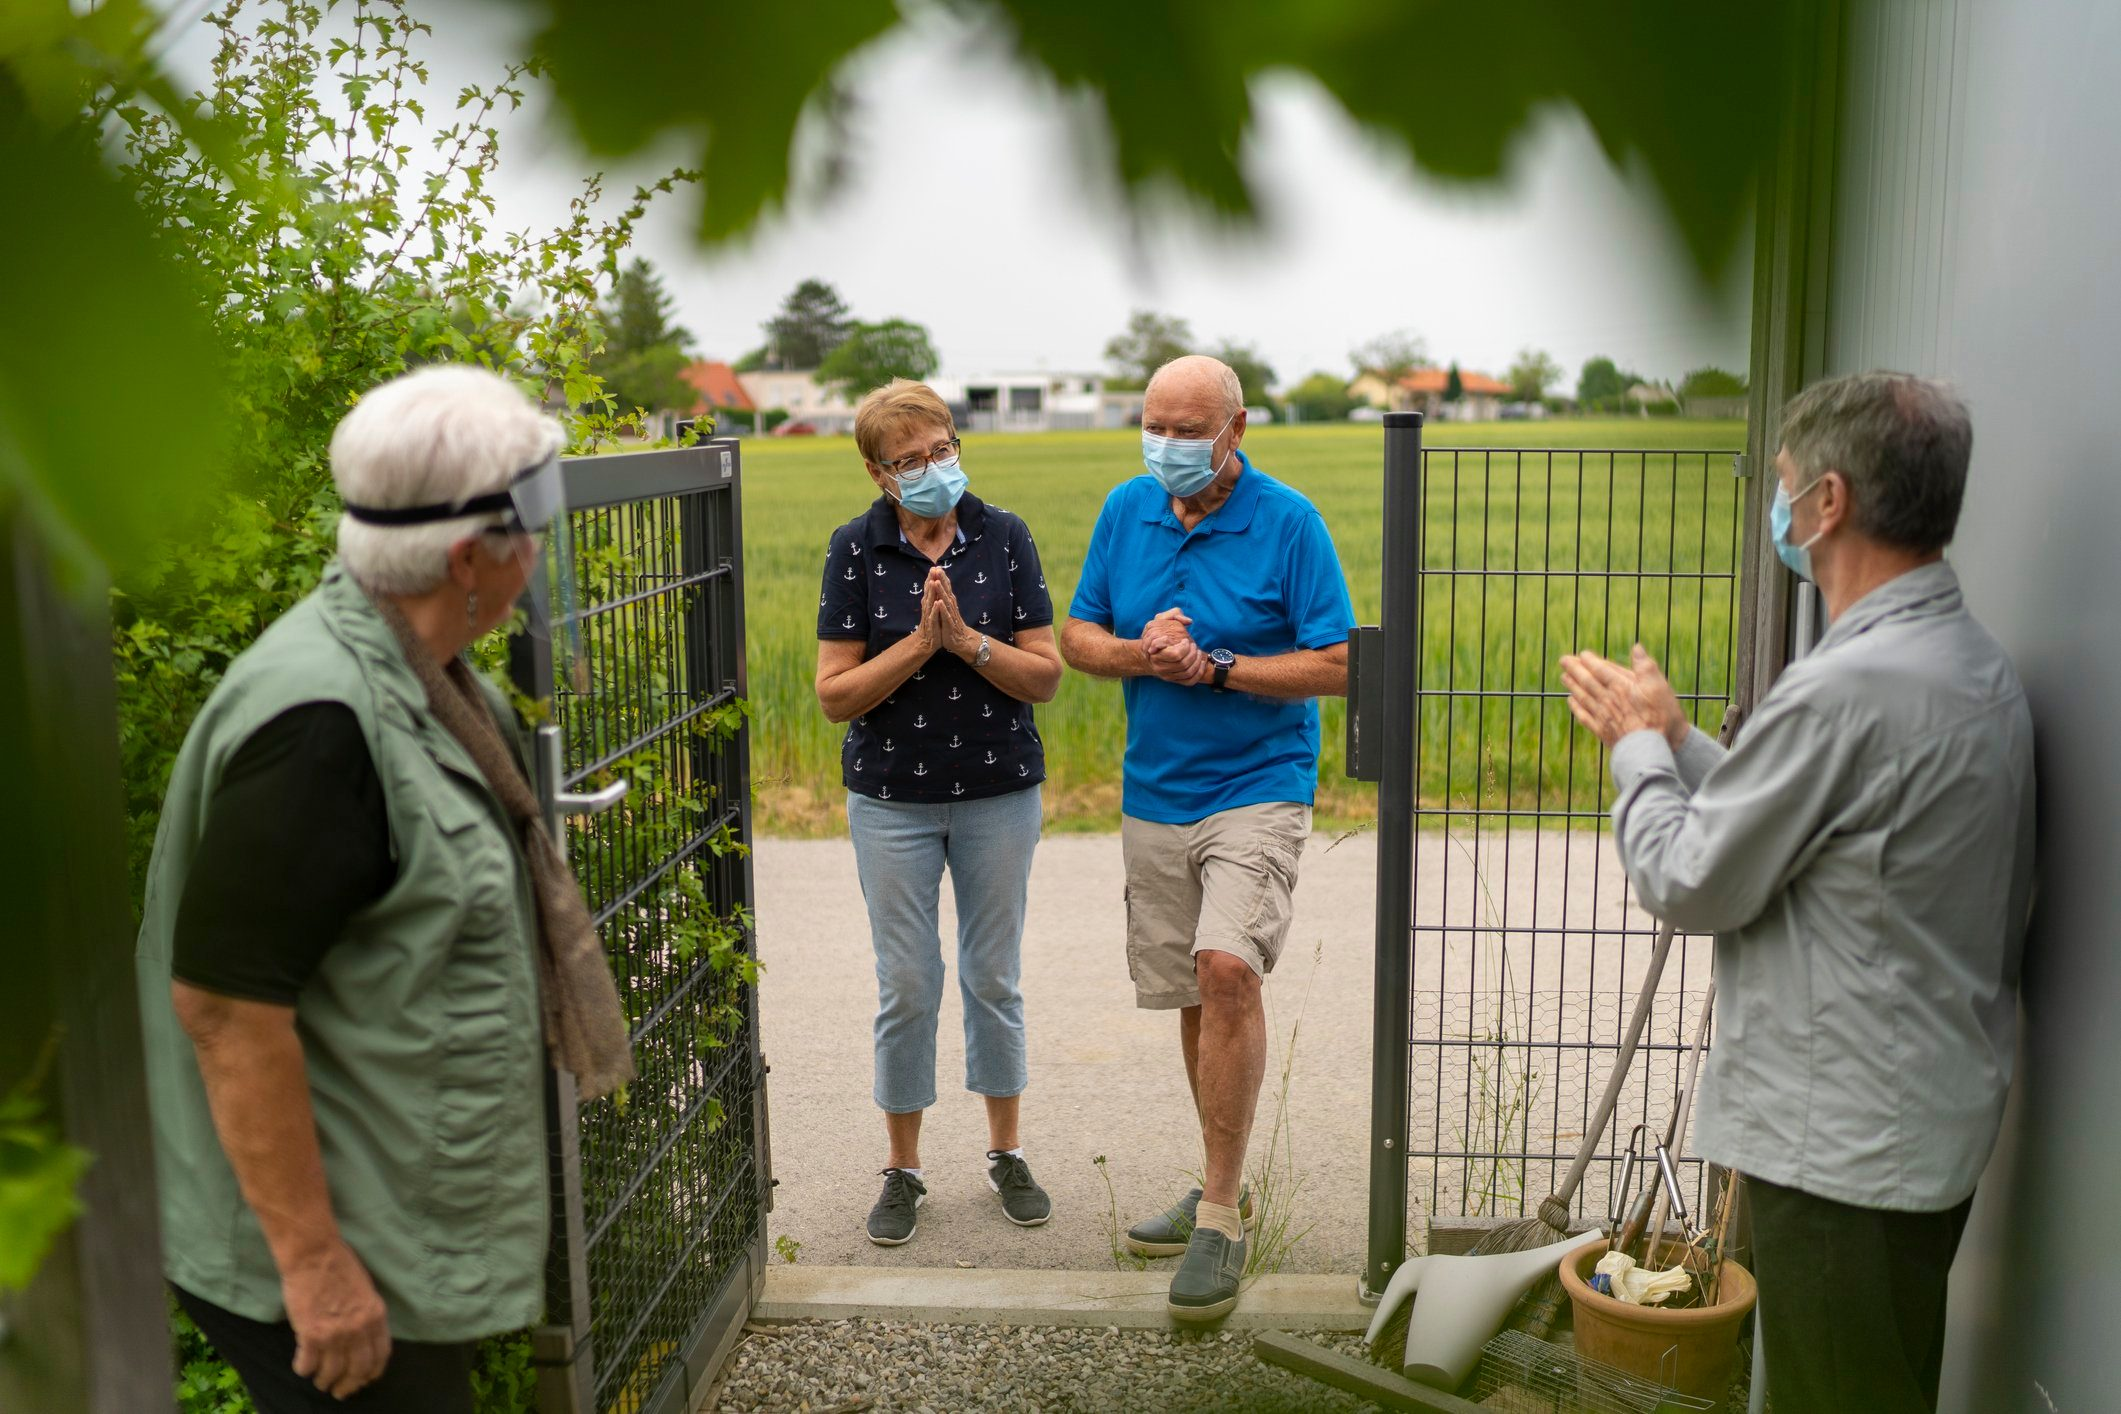 seniors visiting at garden fence door, new greetings in times of coronavirus